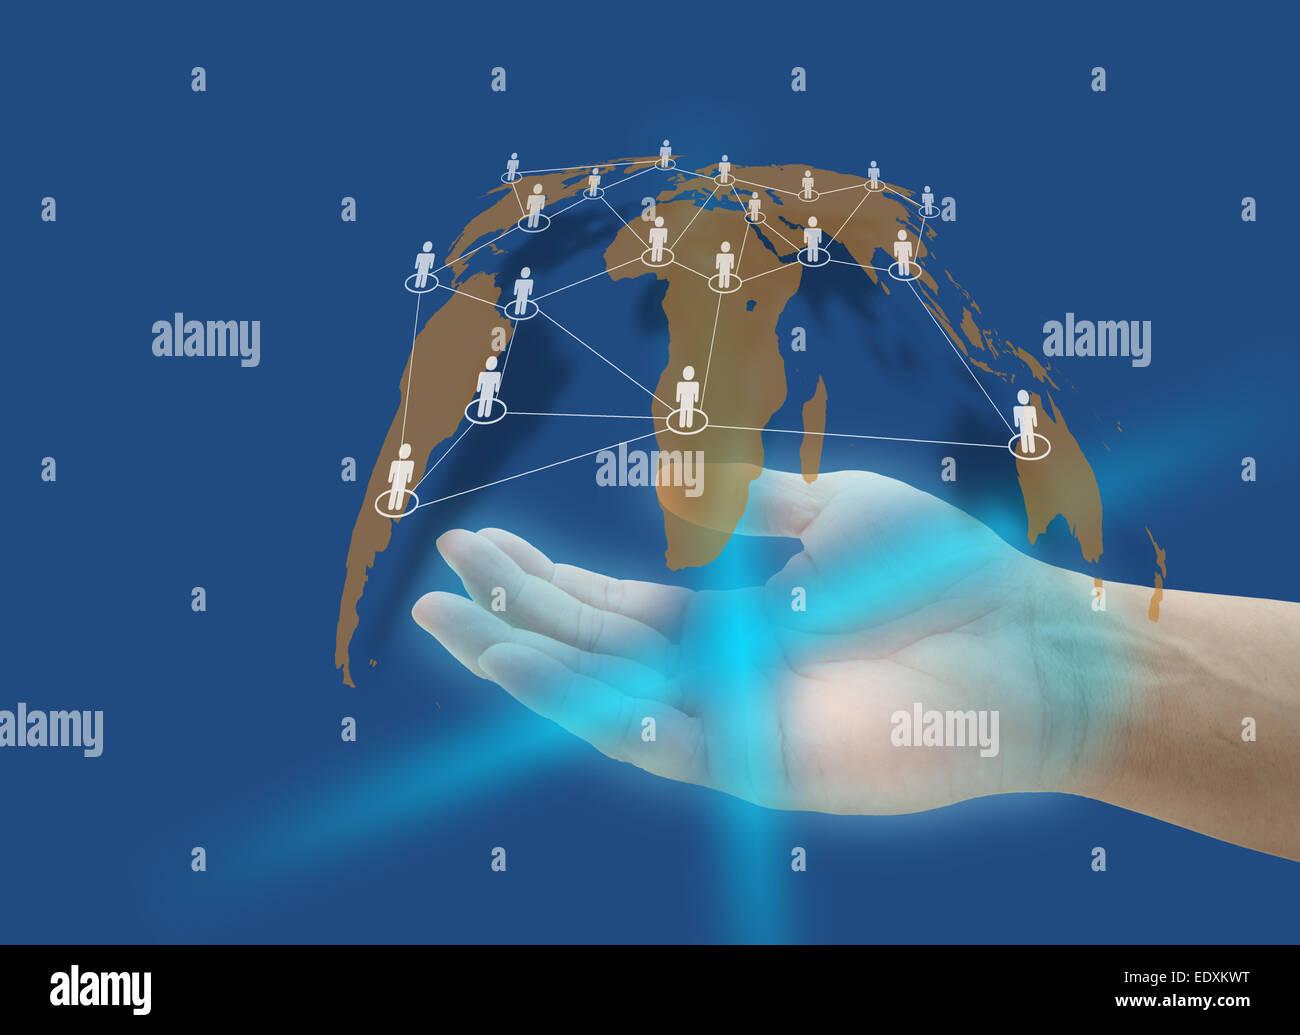 Hand halten soziale Netzwerk Verbindung Technologiekonzept Stockbild